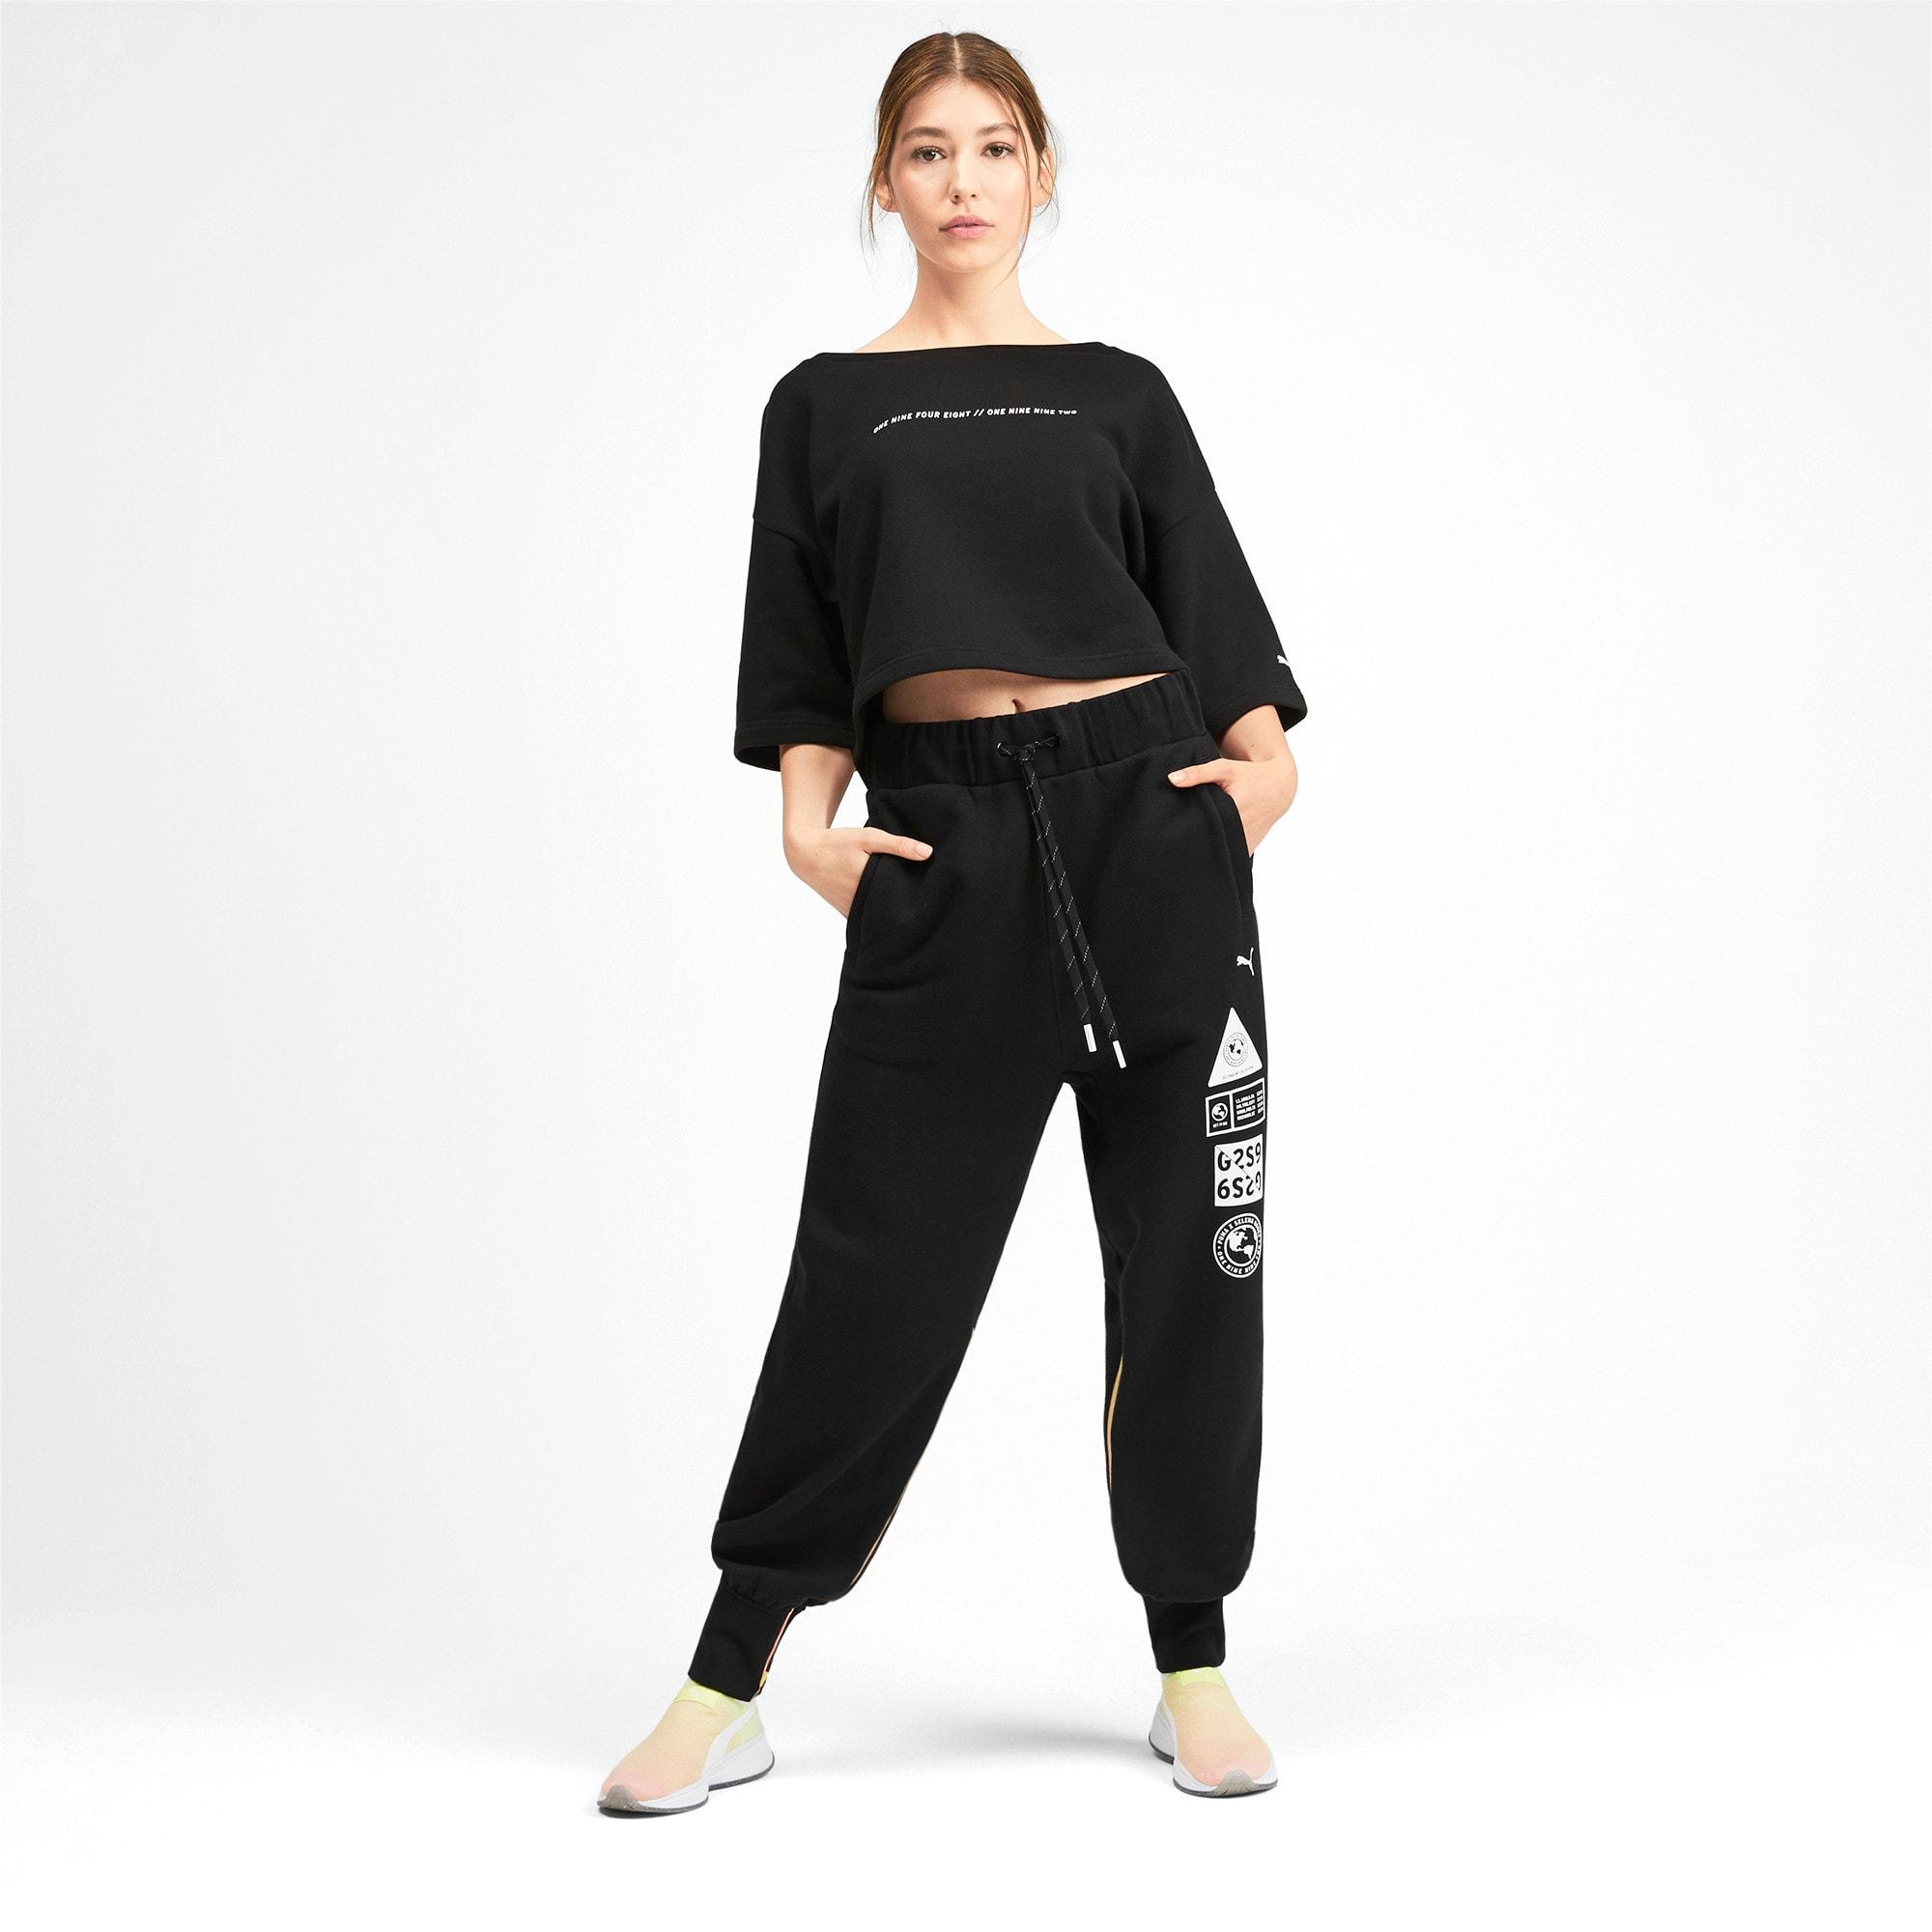 Thumbnail 3 of PUMA x SELENA GOMEZ Women's Sweatpants, Puma Black, medium